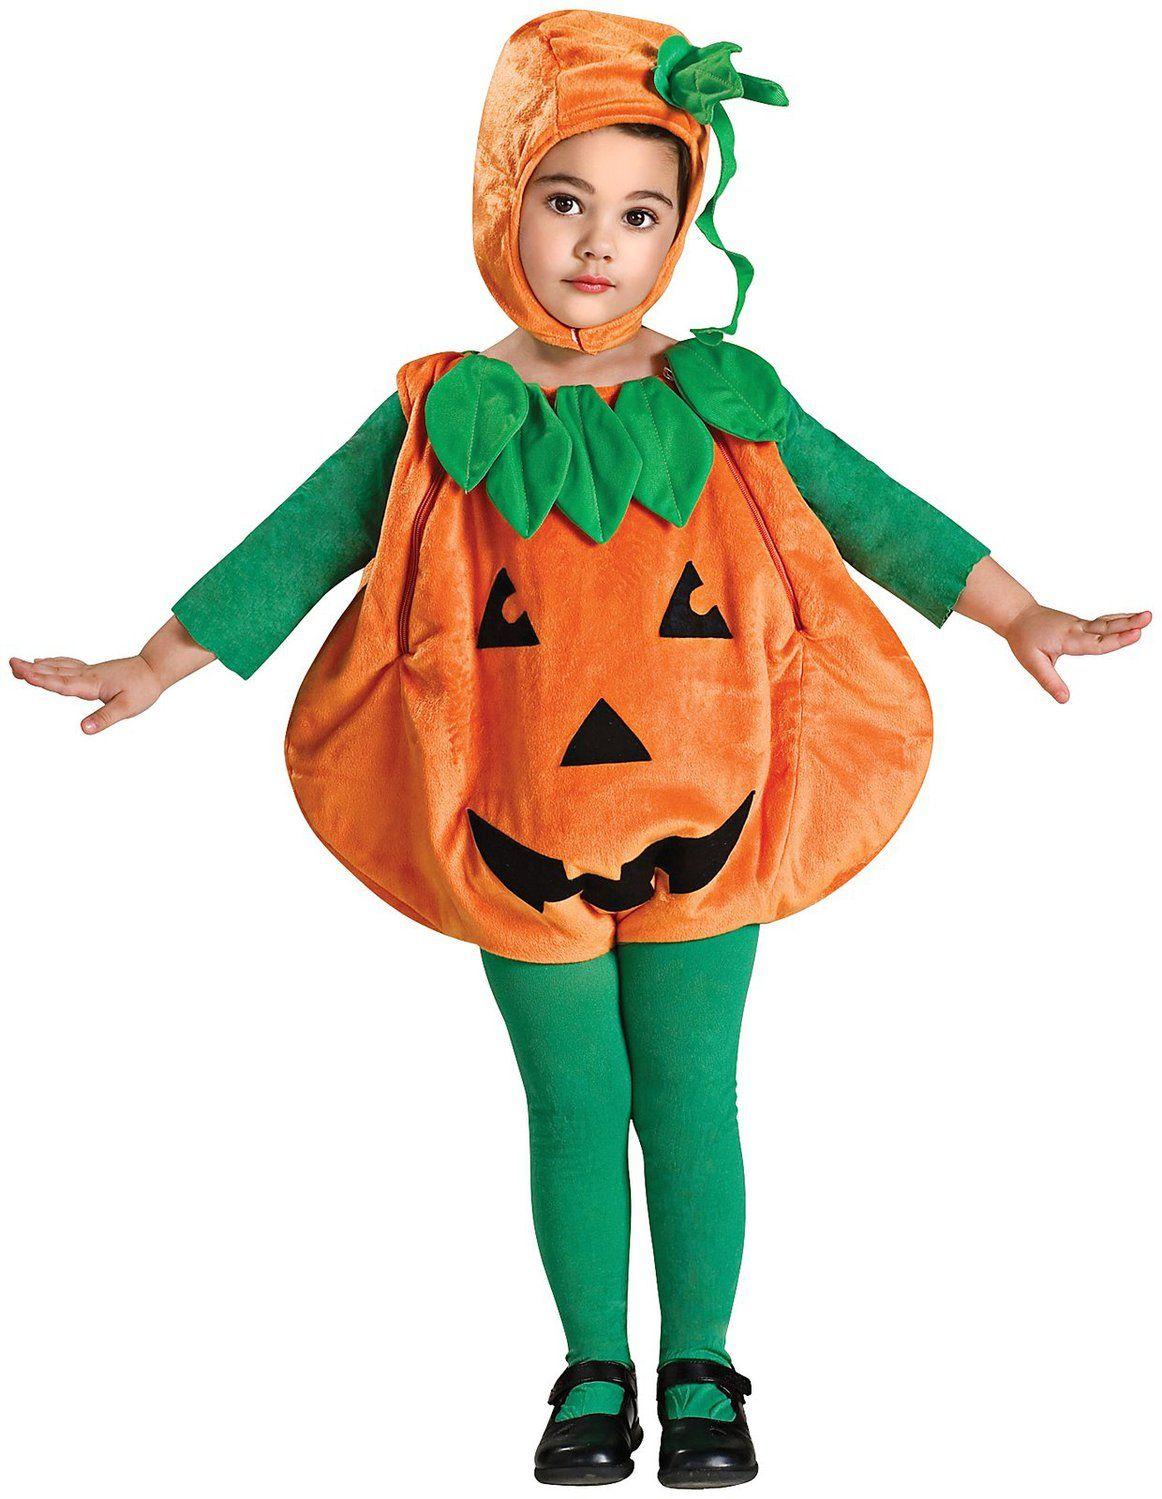 pumpkin costume Kids pumpkin costume, Toddler girl